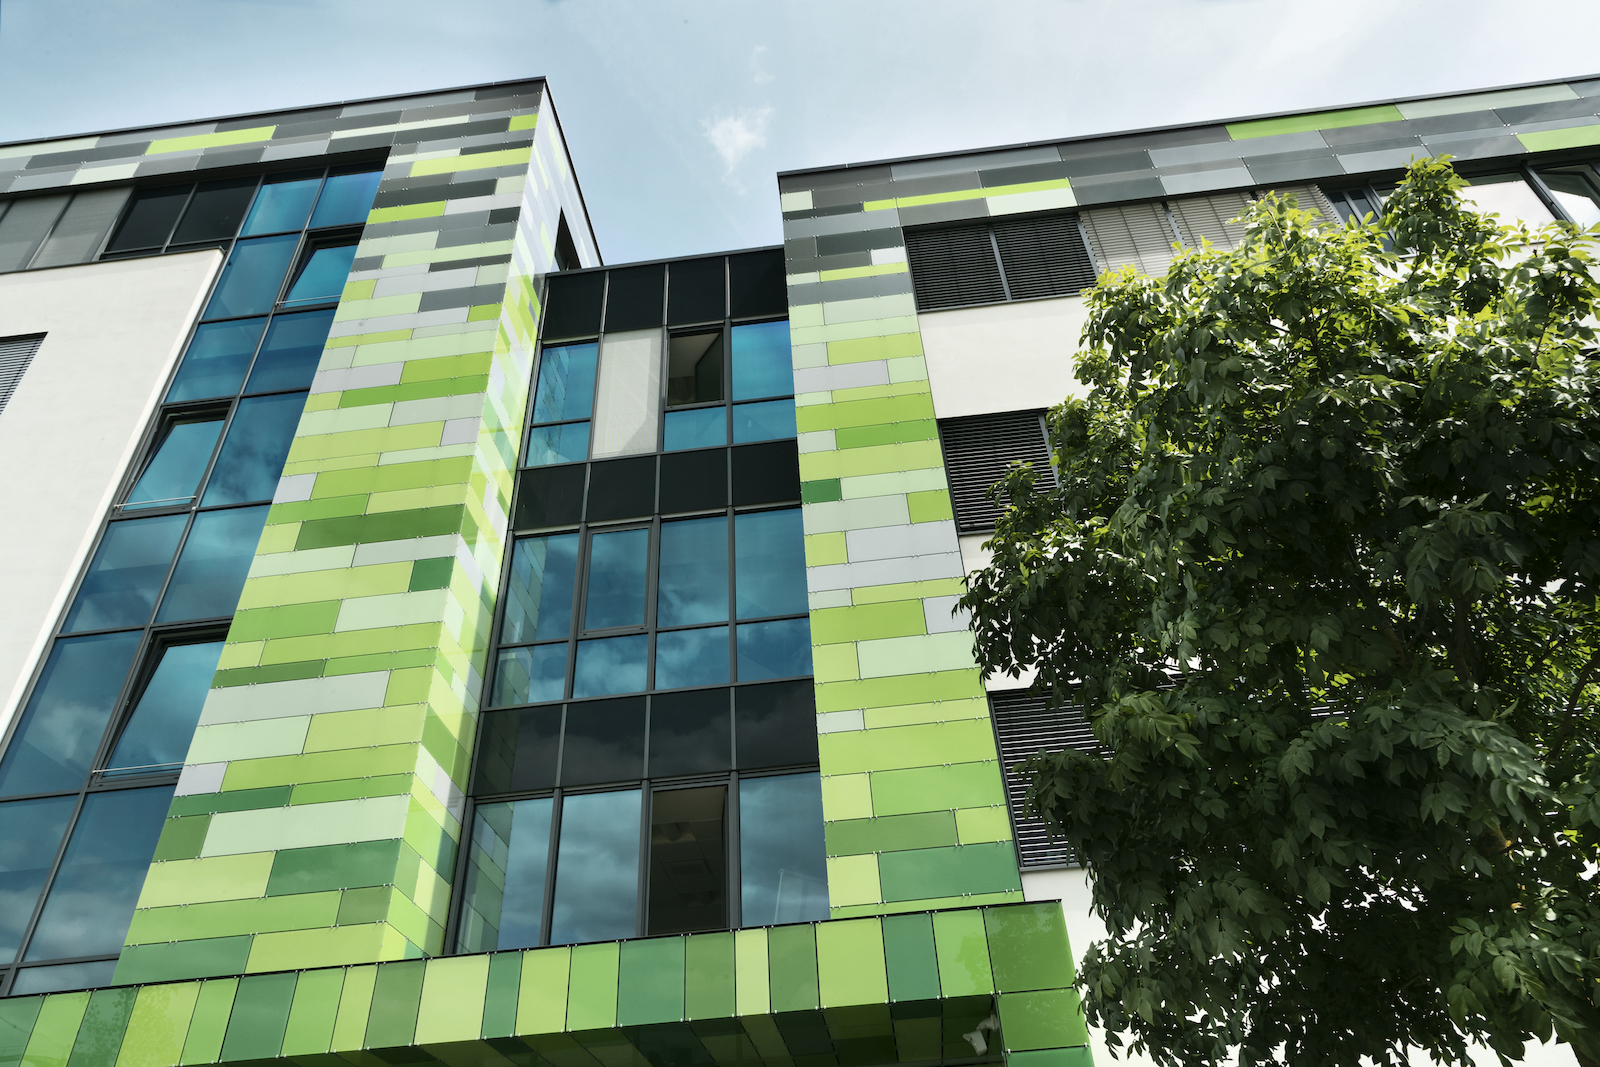 Biontech Will Novartis Werk In Marburg Ubernehmen Apotheke Adhoc